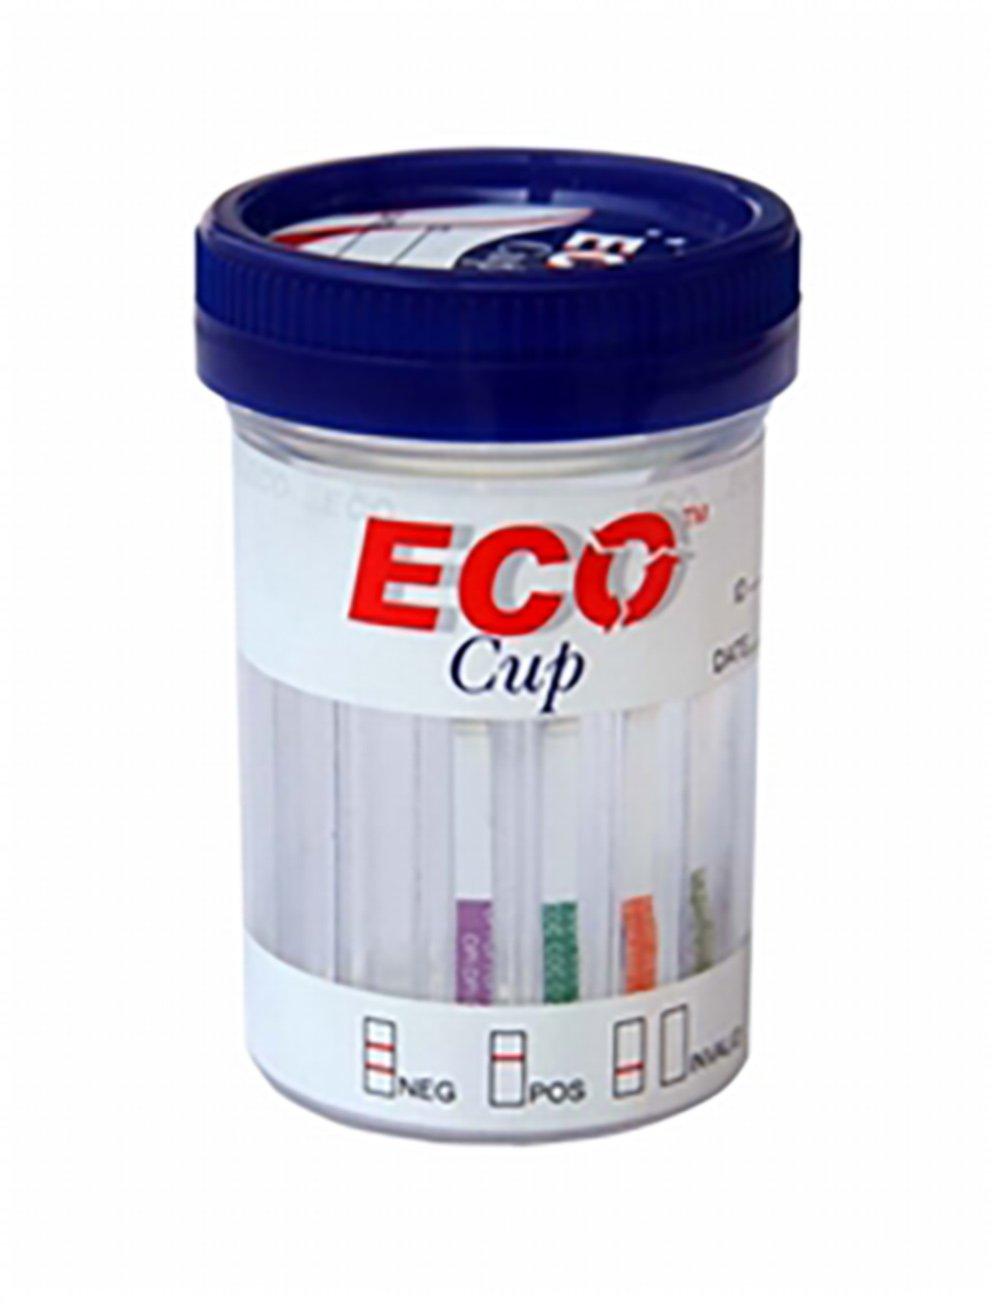 10 Panel ECO Cup II (. AMP/Bar/BZO/Pille/mAMP/MDMA T-/mtd/OPI/PCP/THC) CS/25